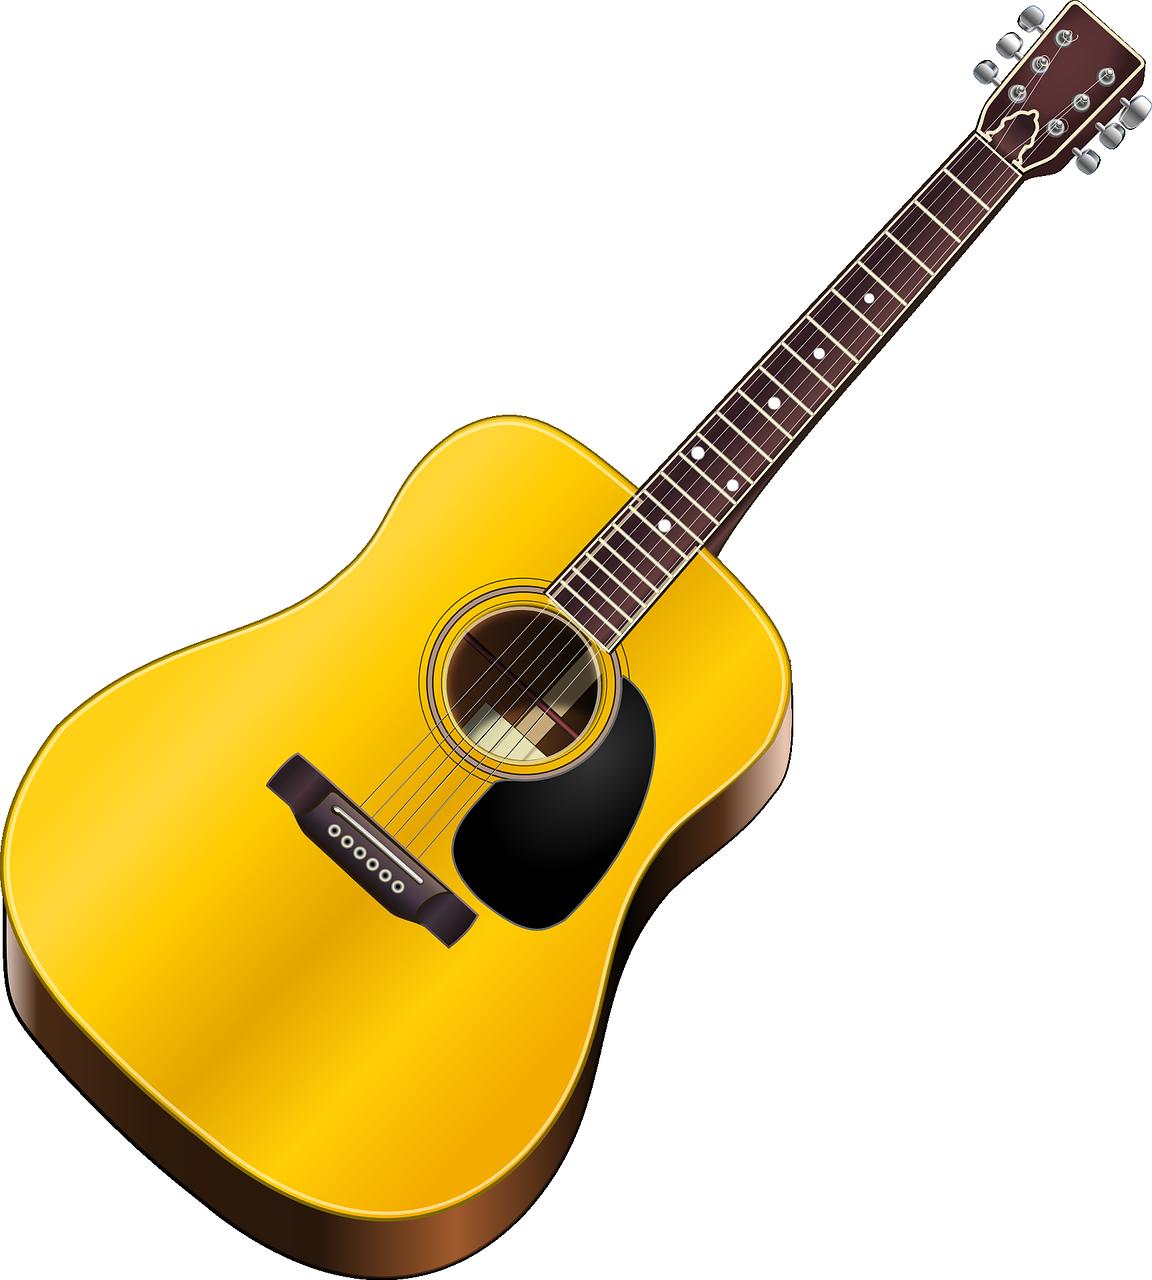 acoustic-guitar-149427_1280